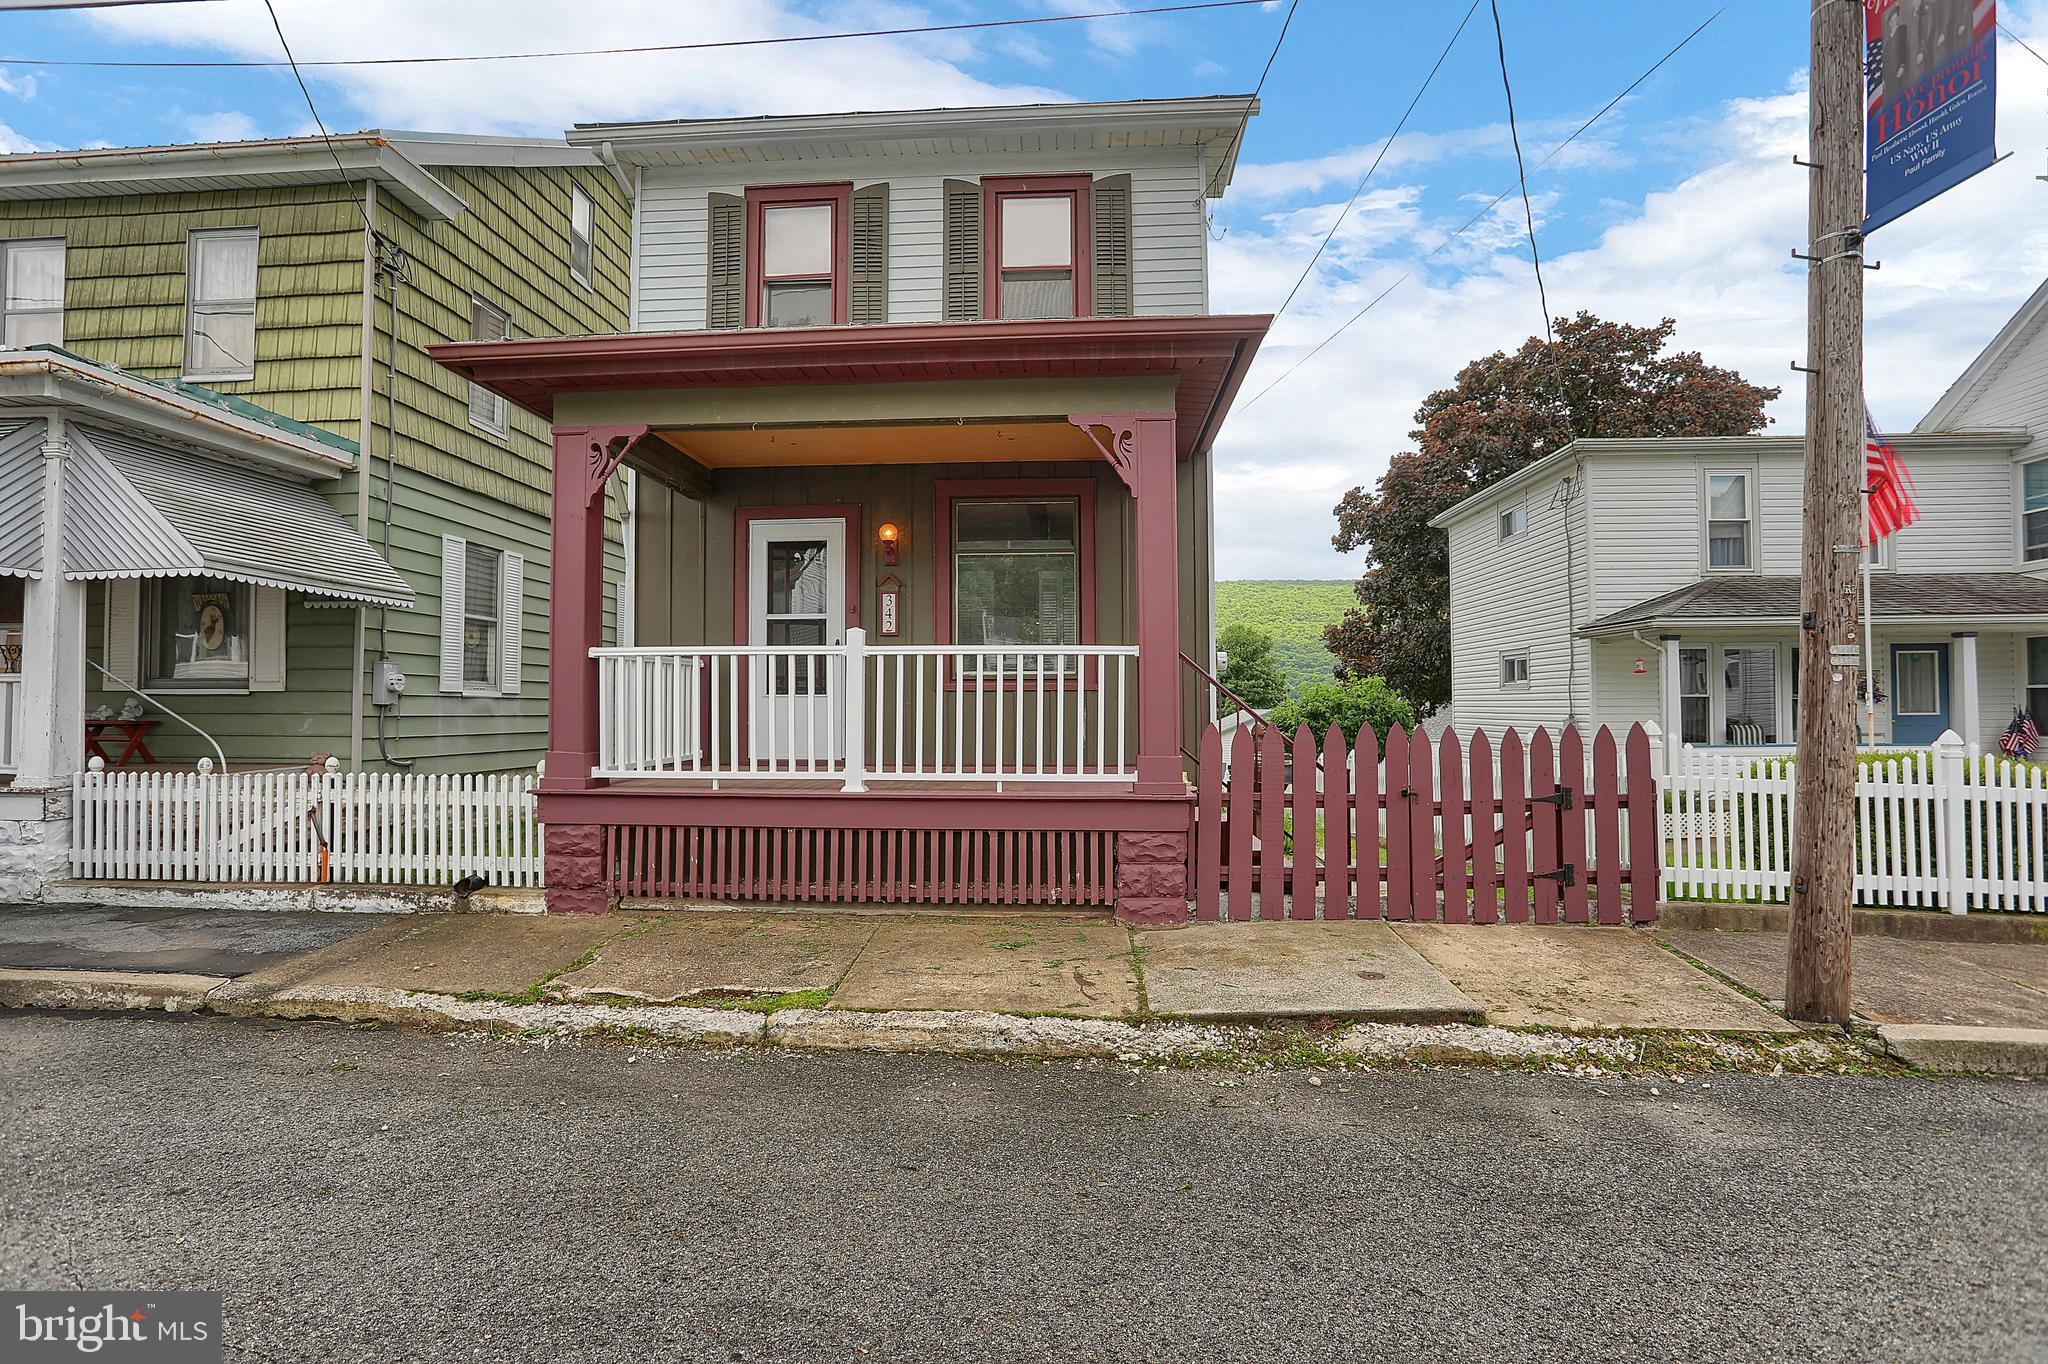 342 ELIZABETH STREET, WILLIAMSTOWN, PA 17098